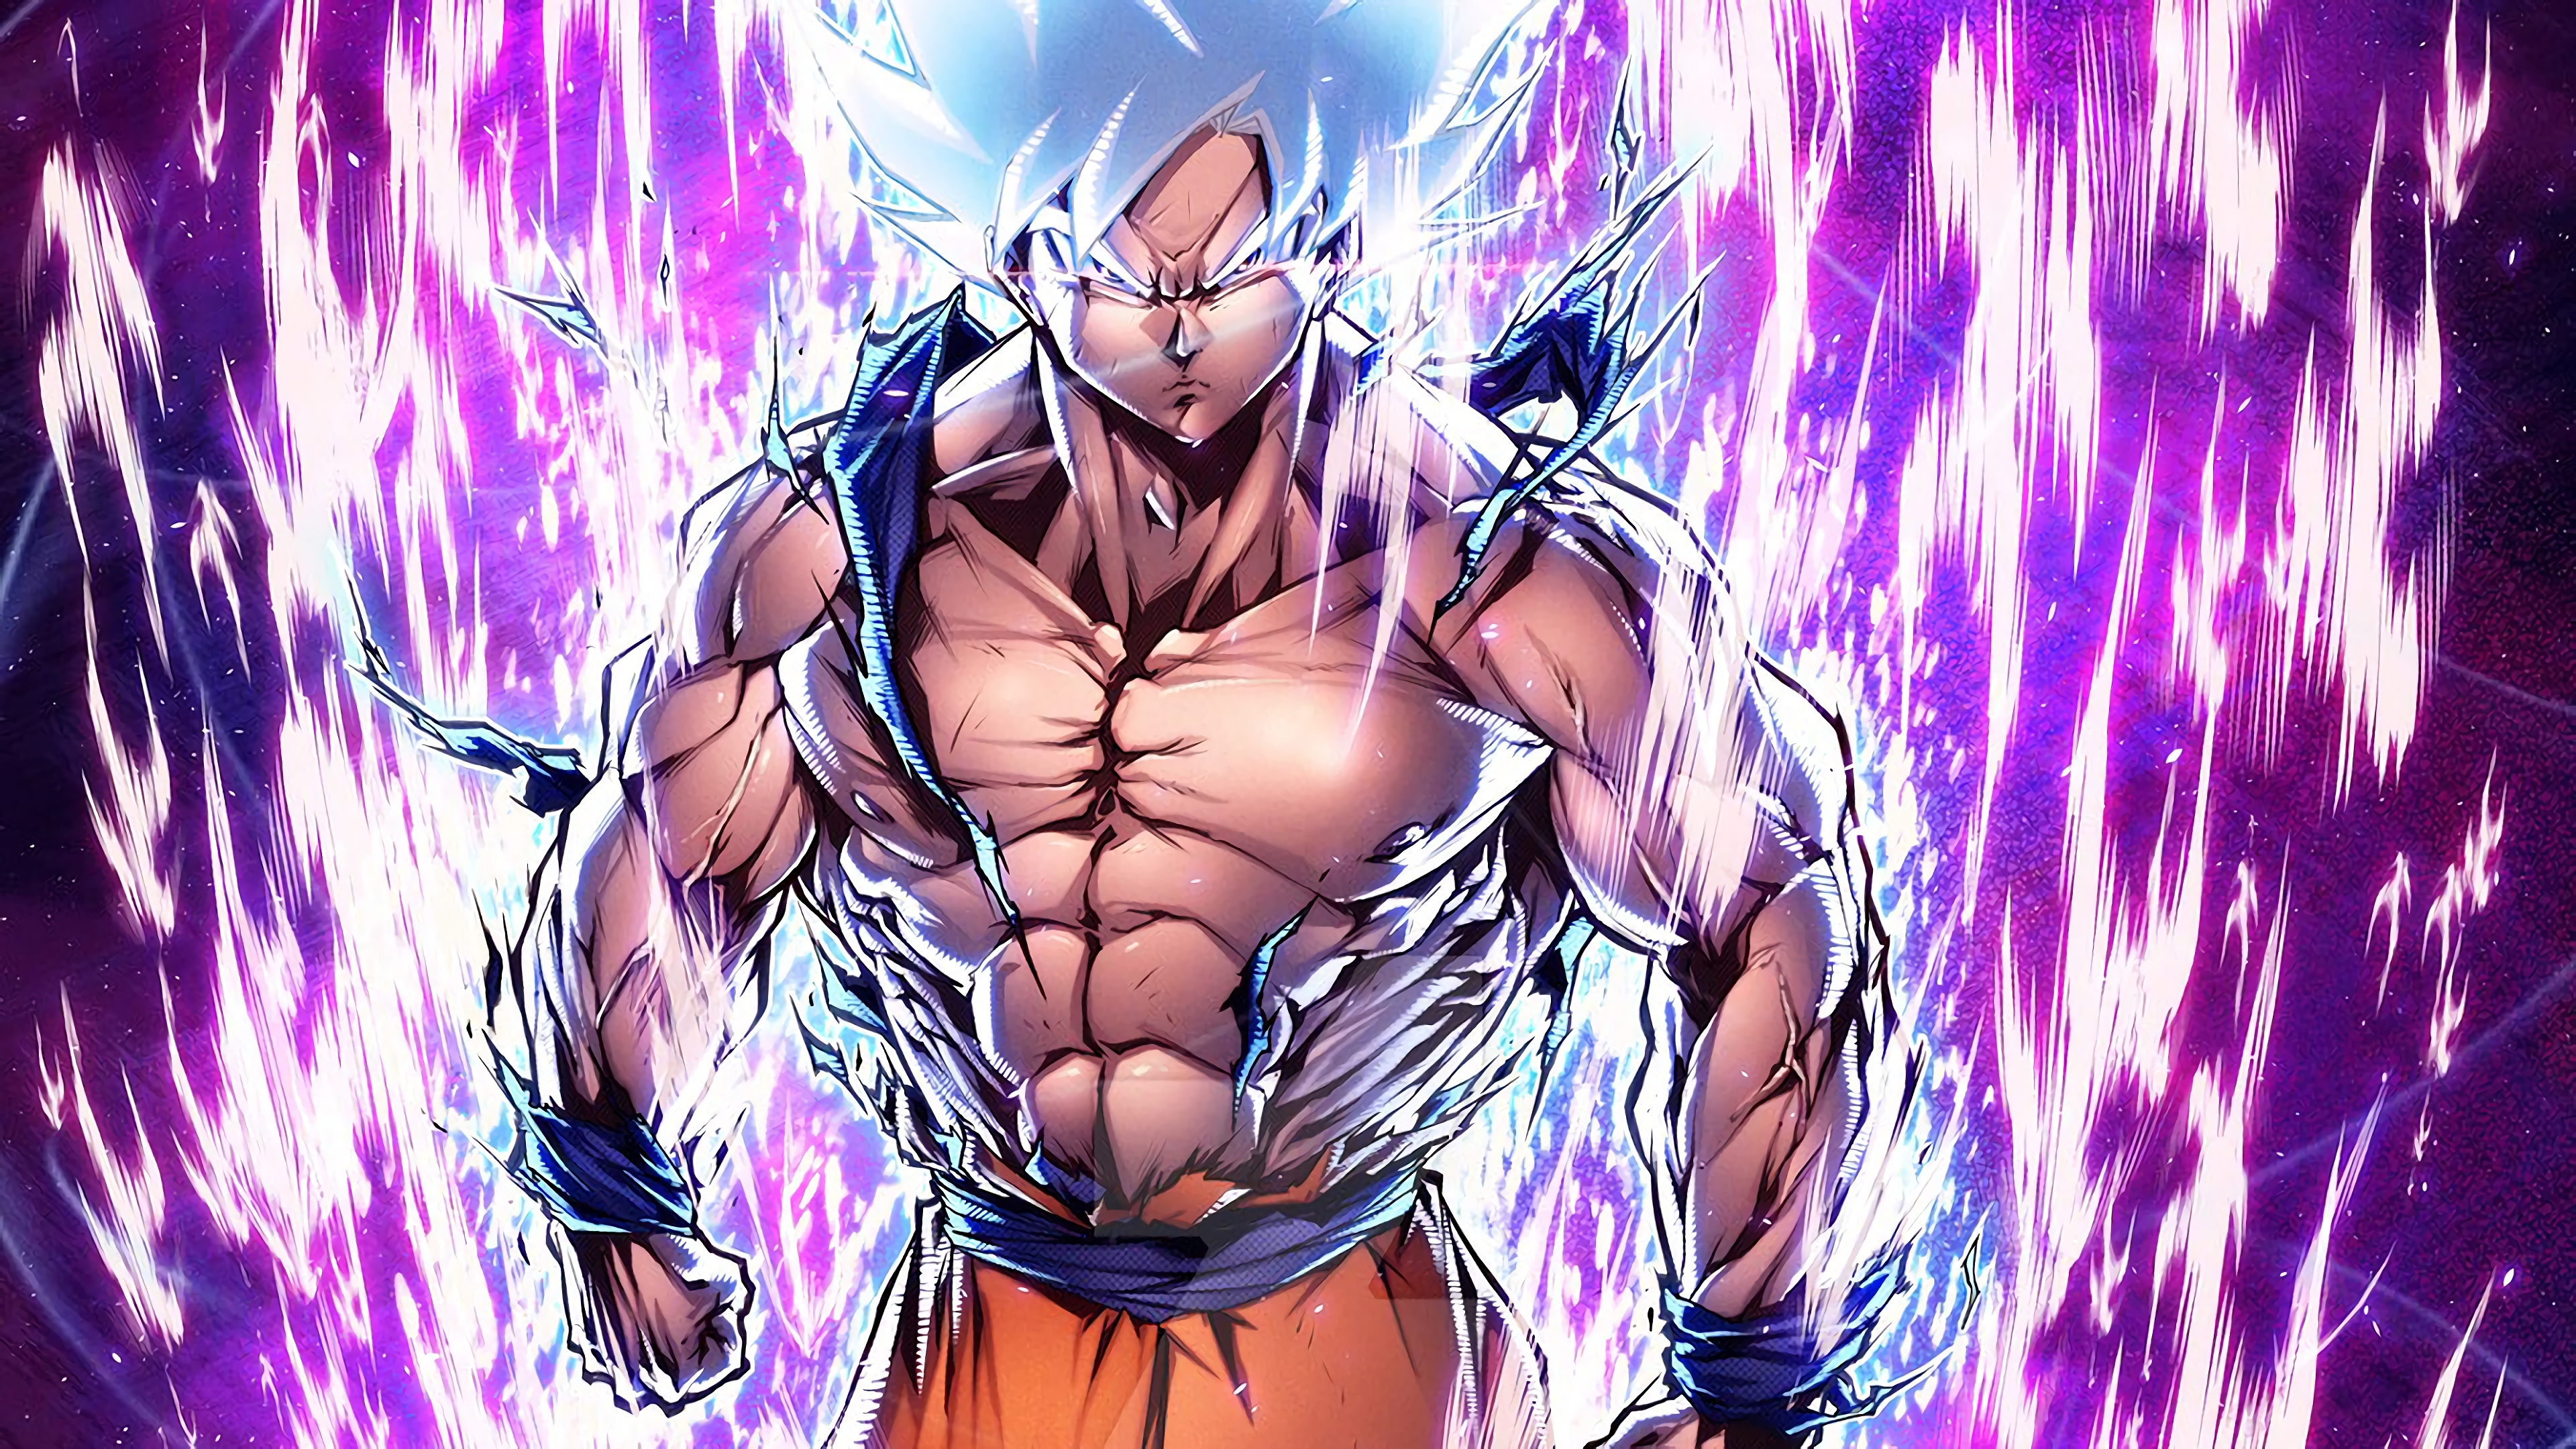 Goku Ultra Instinct Mastered 3840x2160 Wallpaper Teahub Io